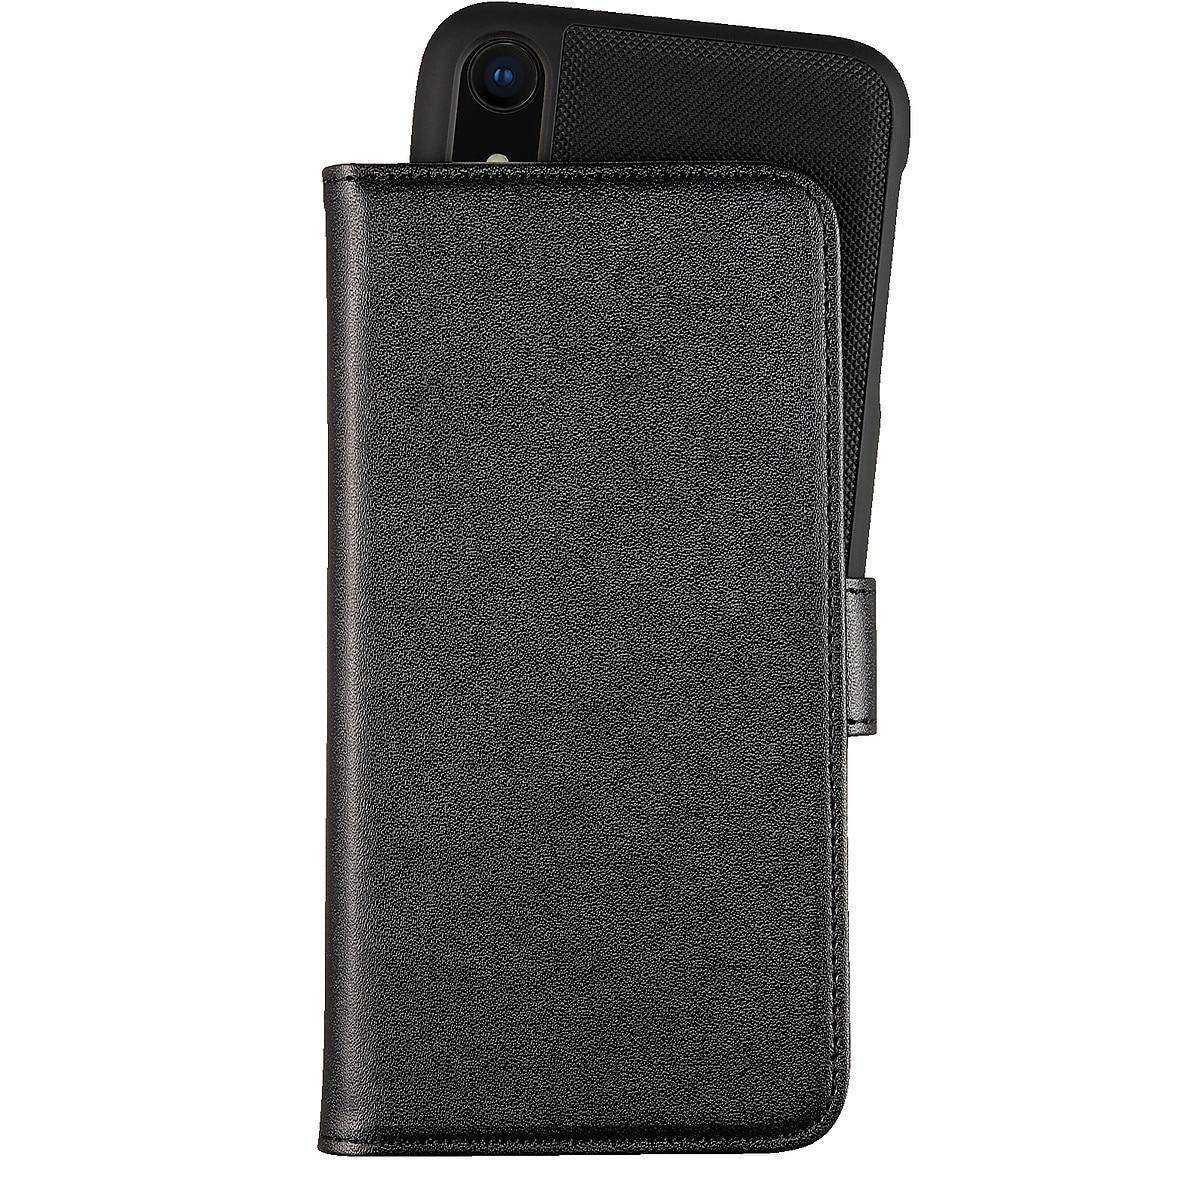 Plånboksfodral för iPhone XR, Holdit